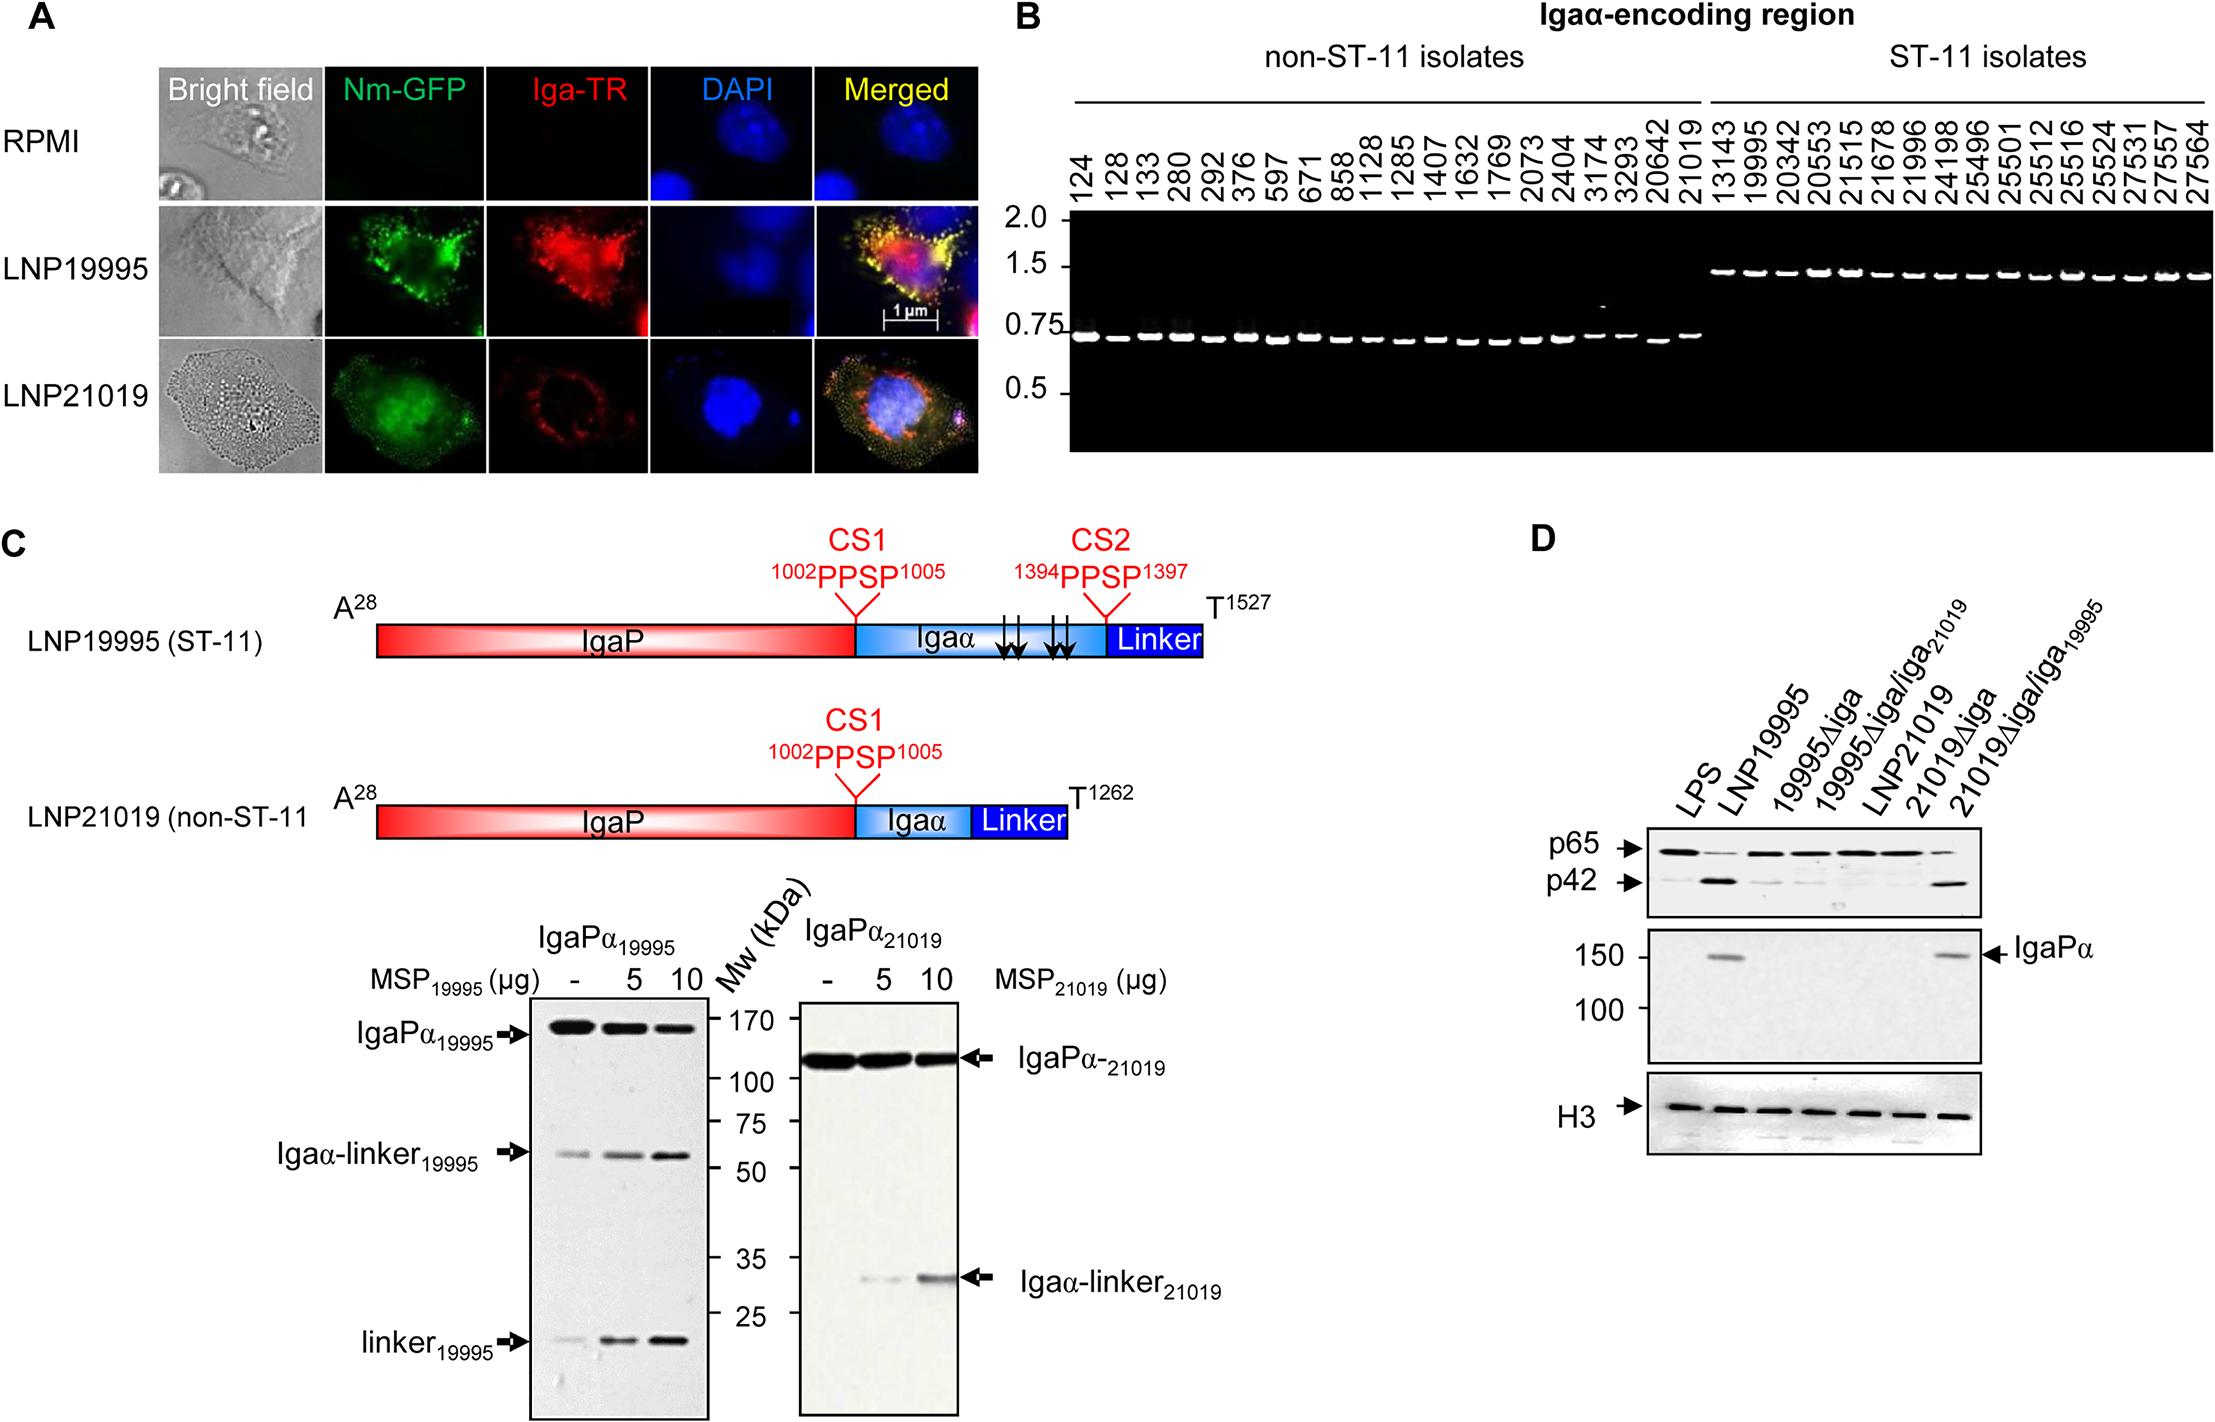 Non-ST-11 isolates release α-peptide-lacking IgA protease.